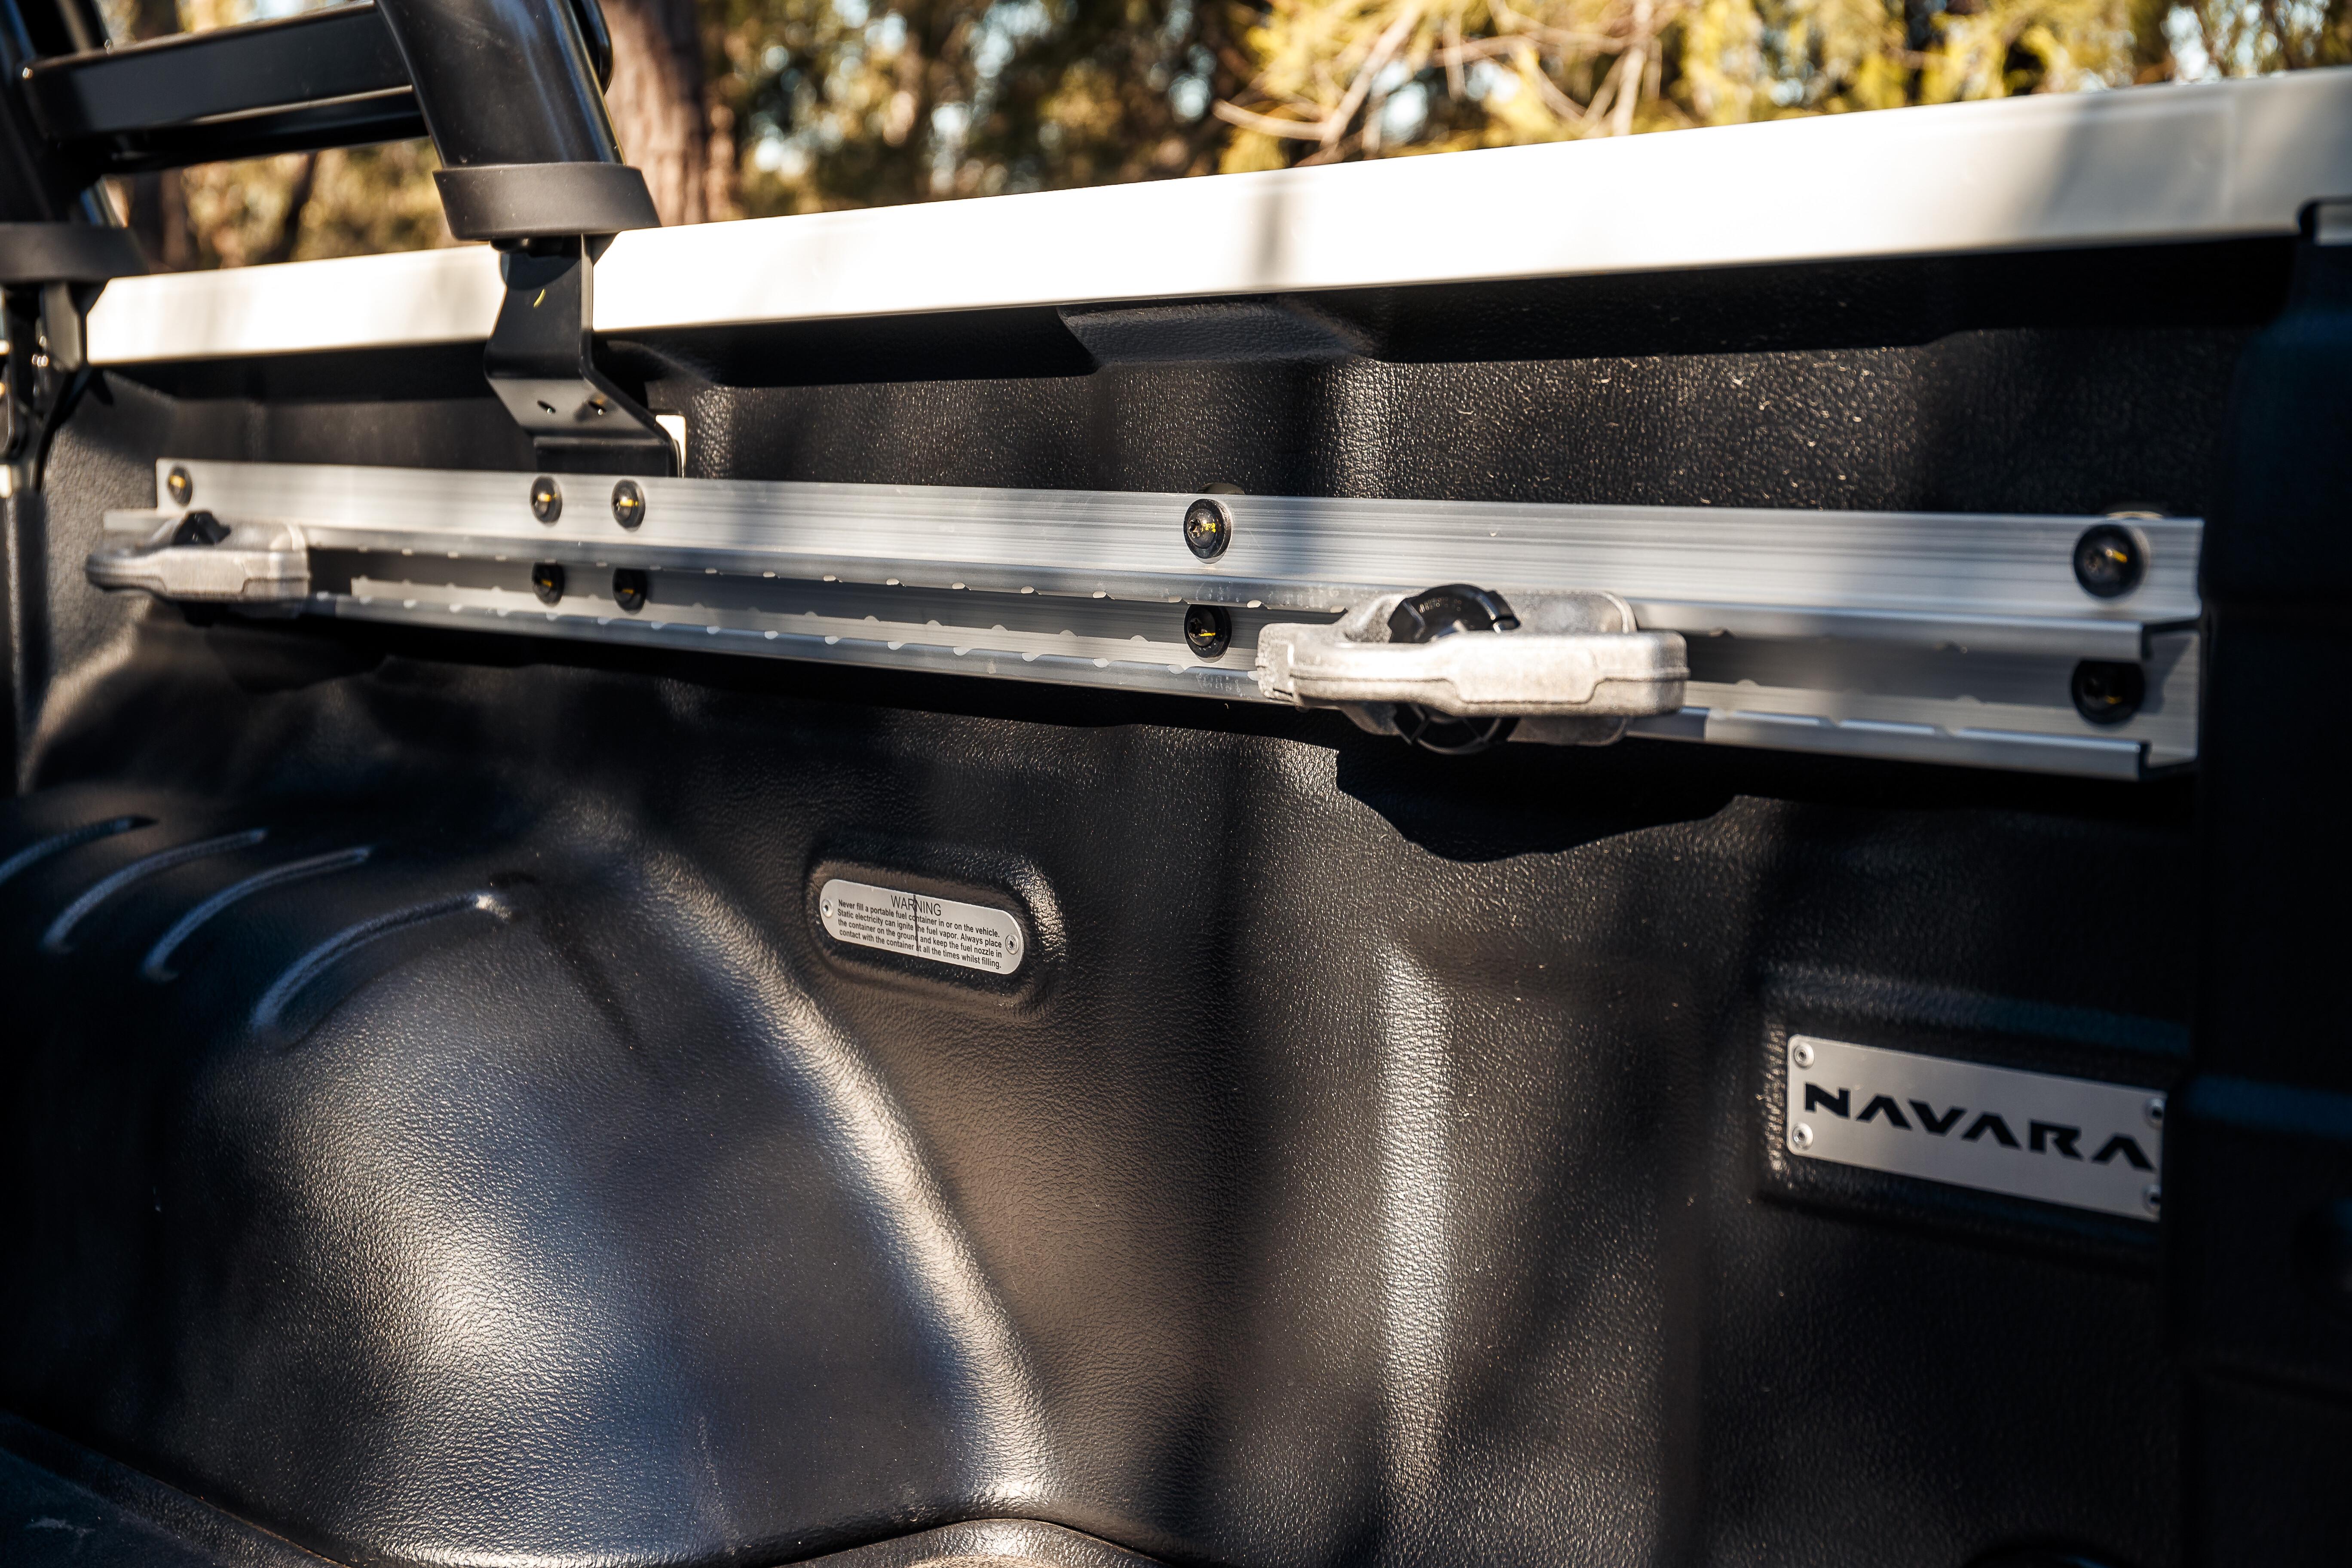 4 X 4 Australia Reviews 2021 May 2021 Nissan Navara PRO 4 X 19